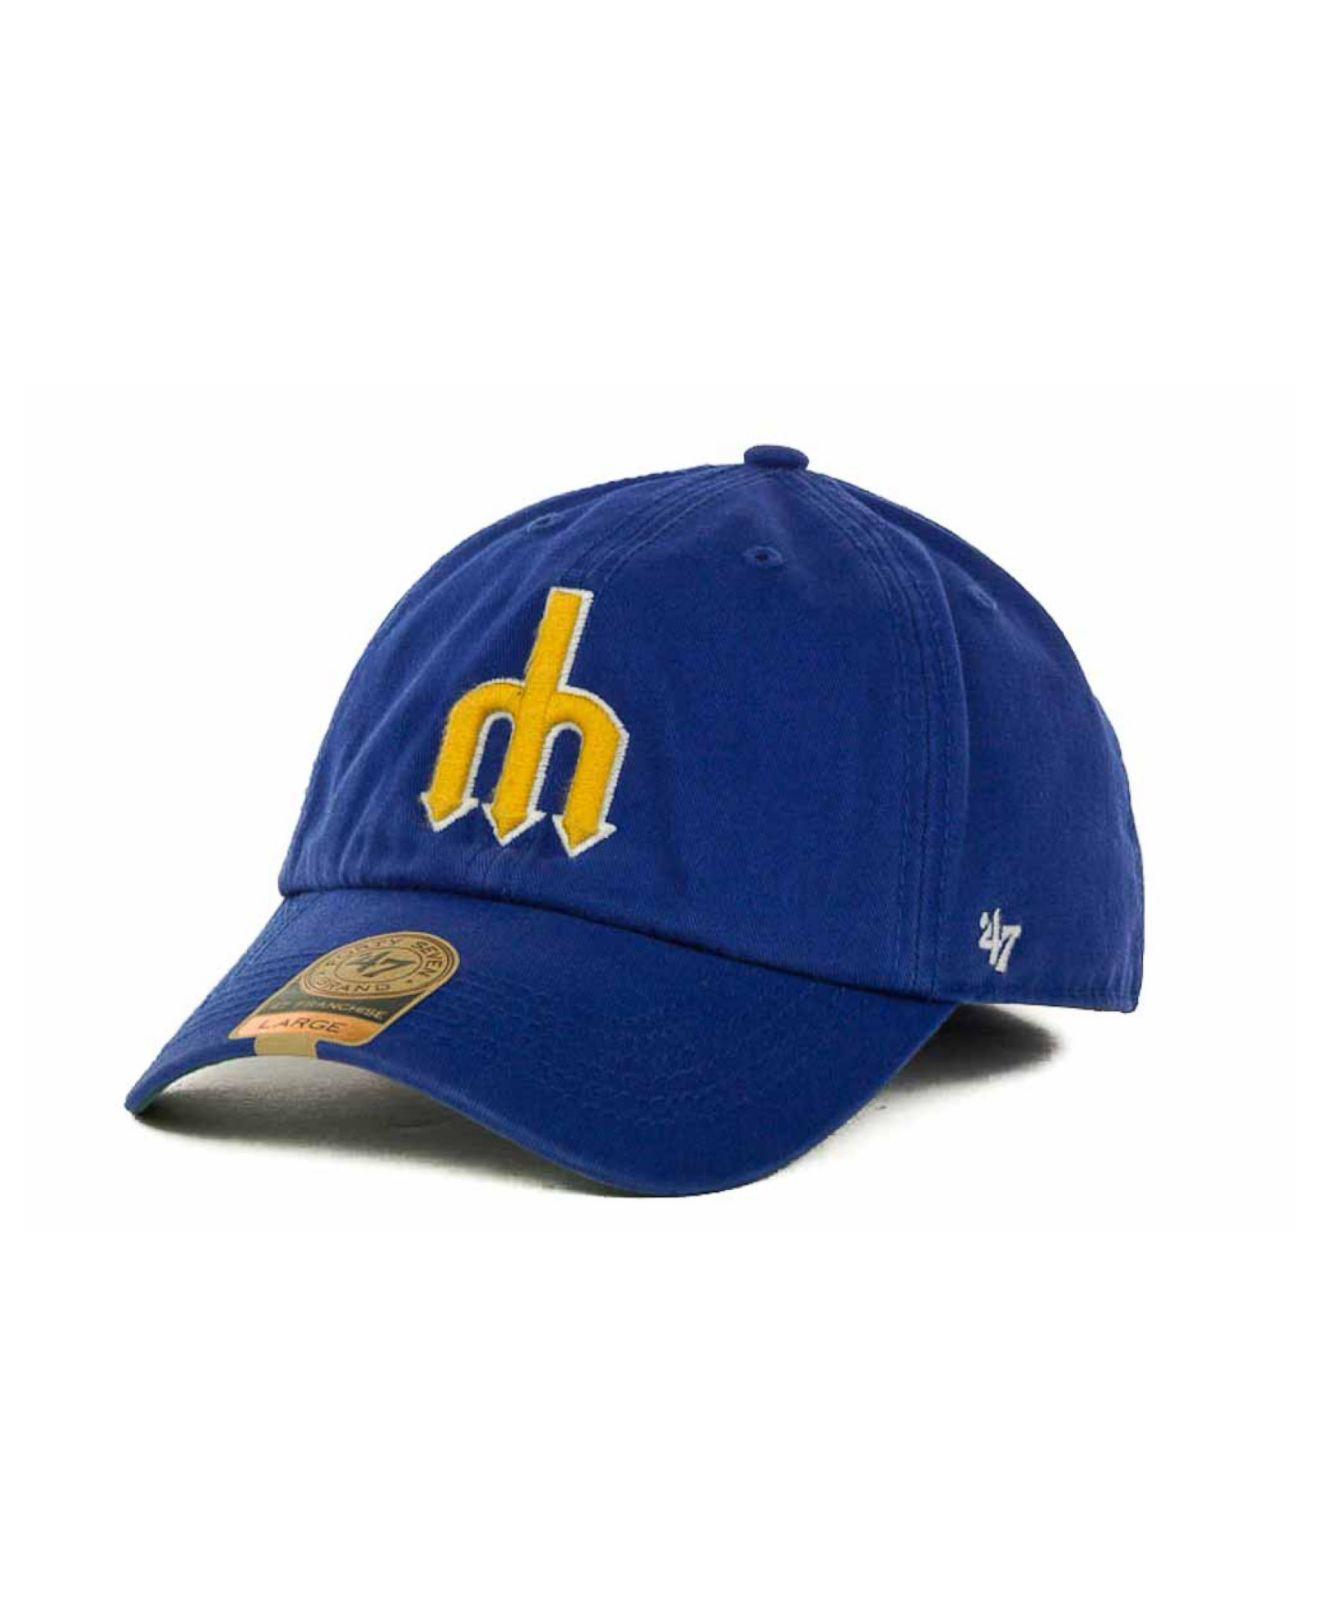 on sale d843f 4fdbb 47 Brand. Men s Green Seattle Mariners Mlb  47 Franchise Cap